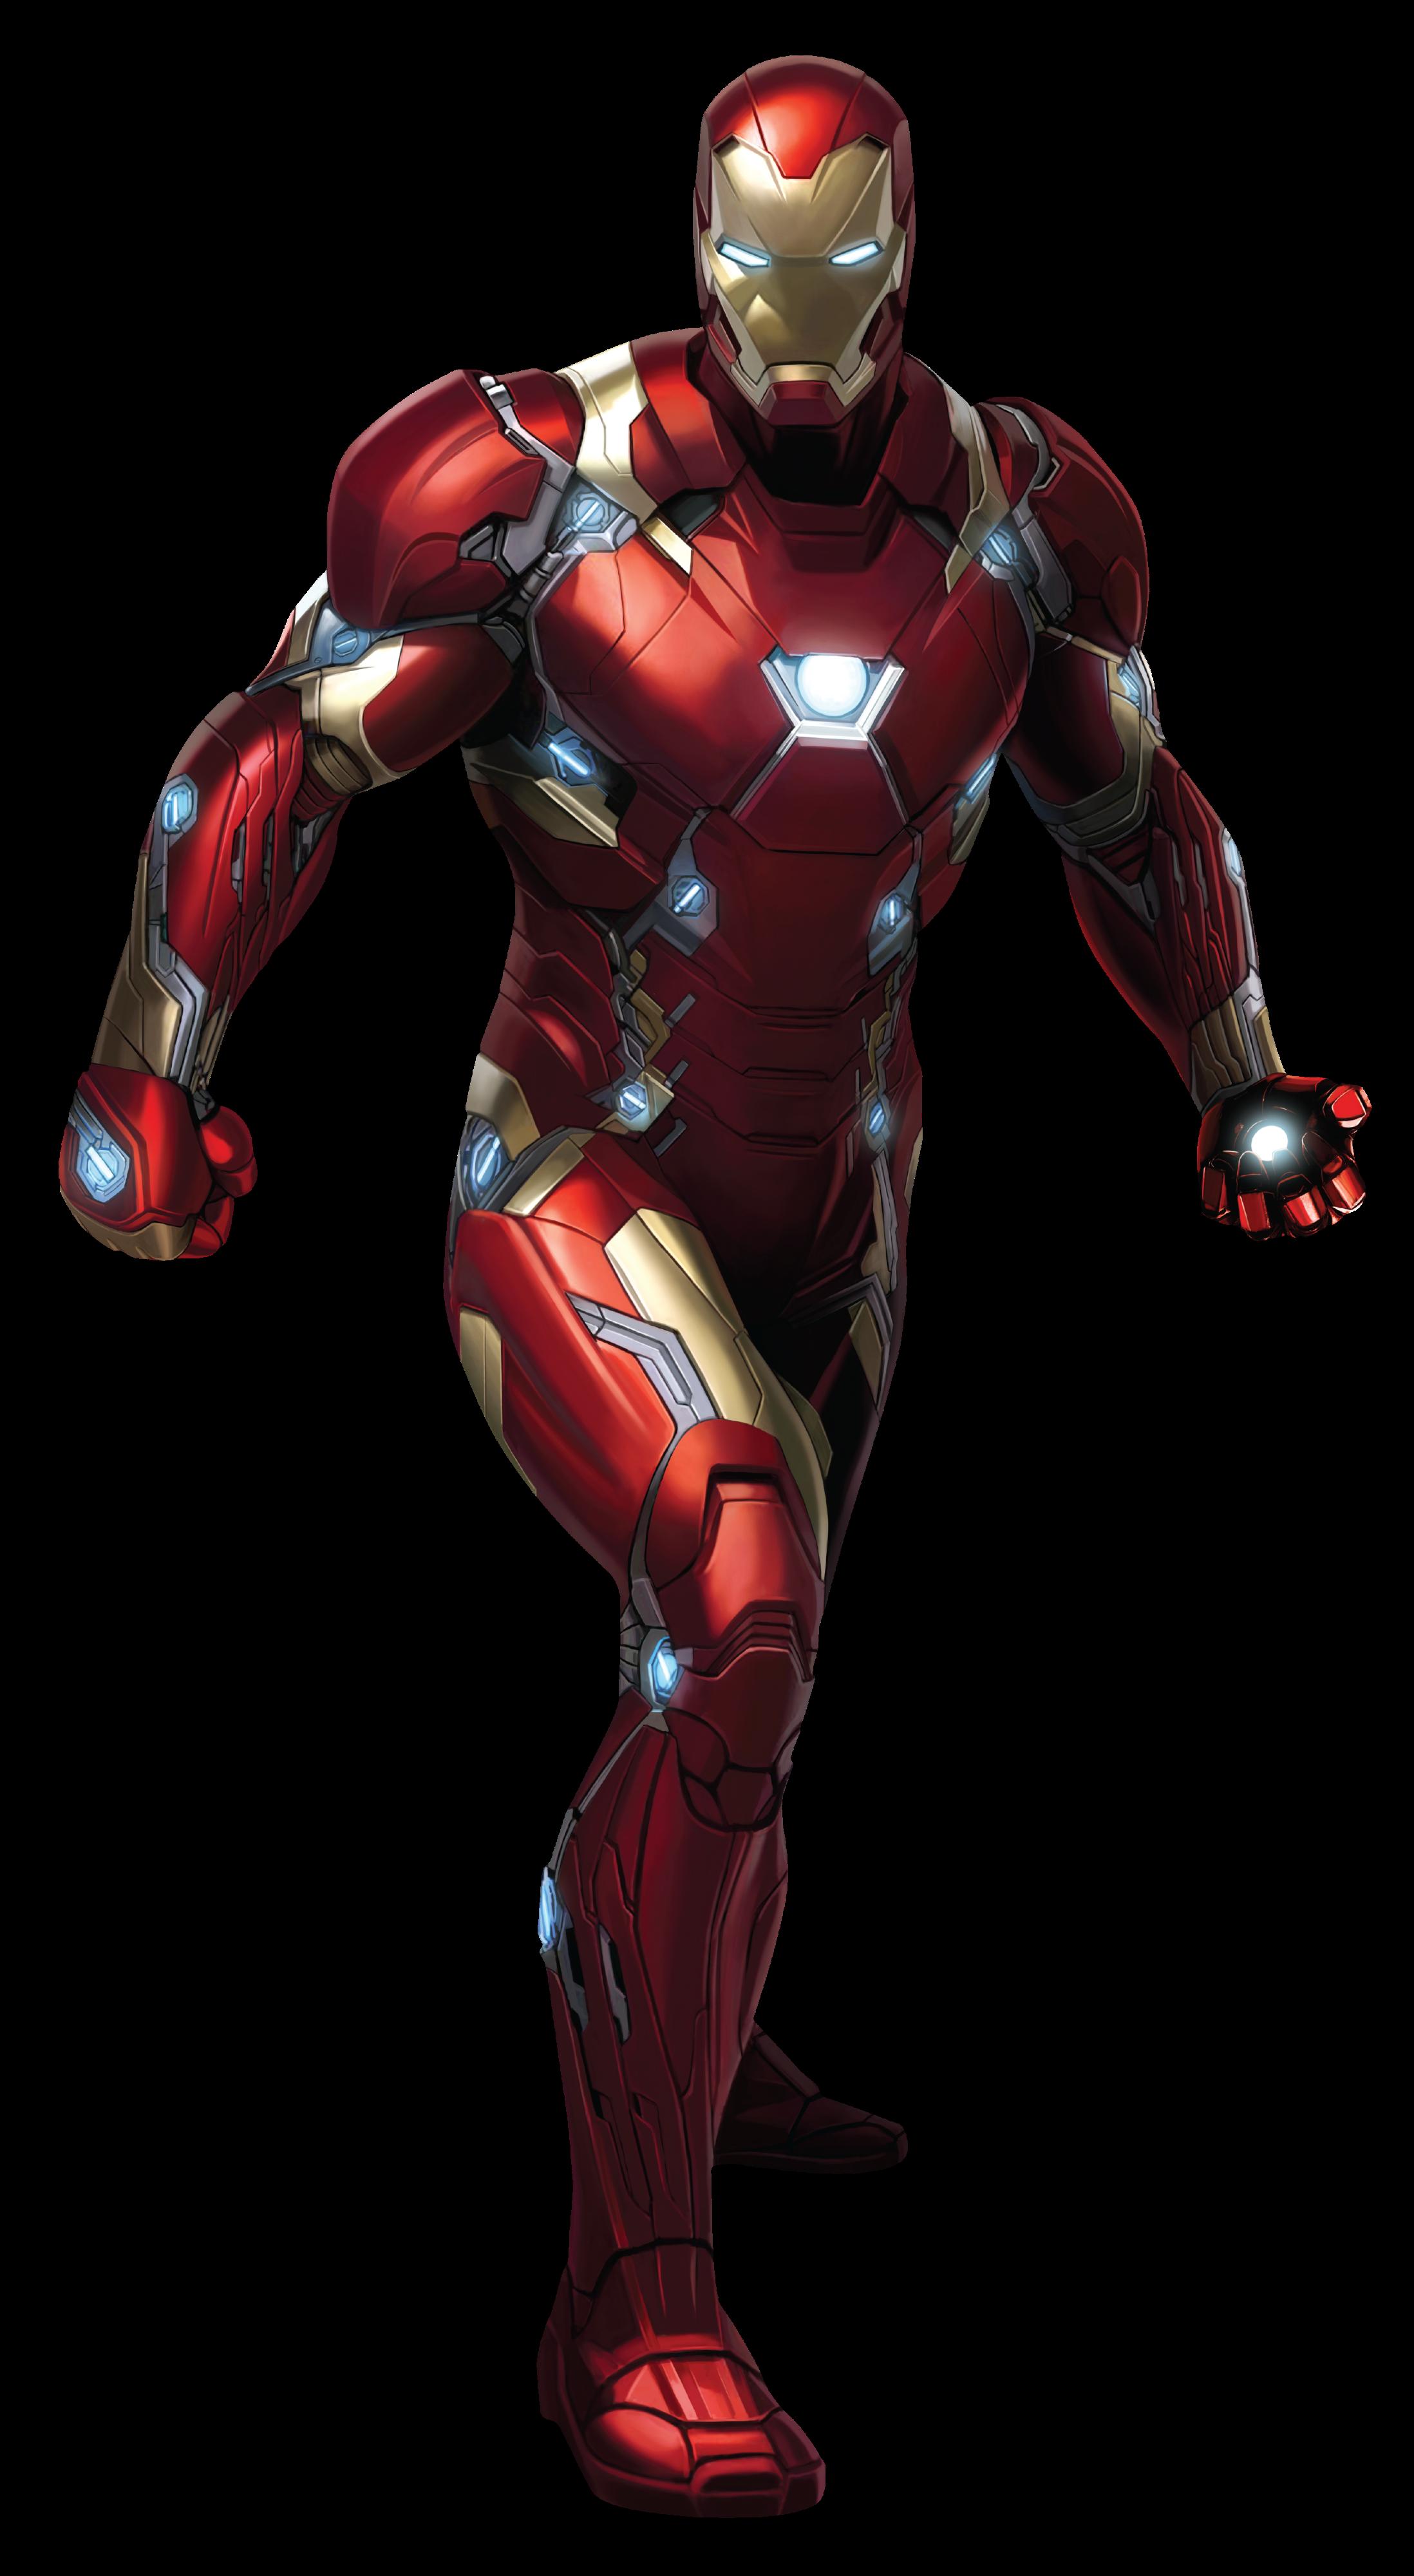 Iron man marvel universe. Hands clipart ironman